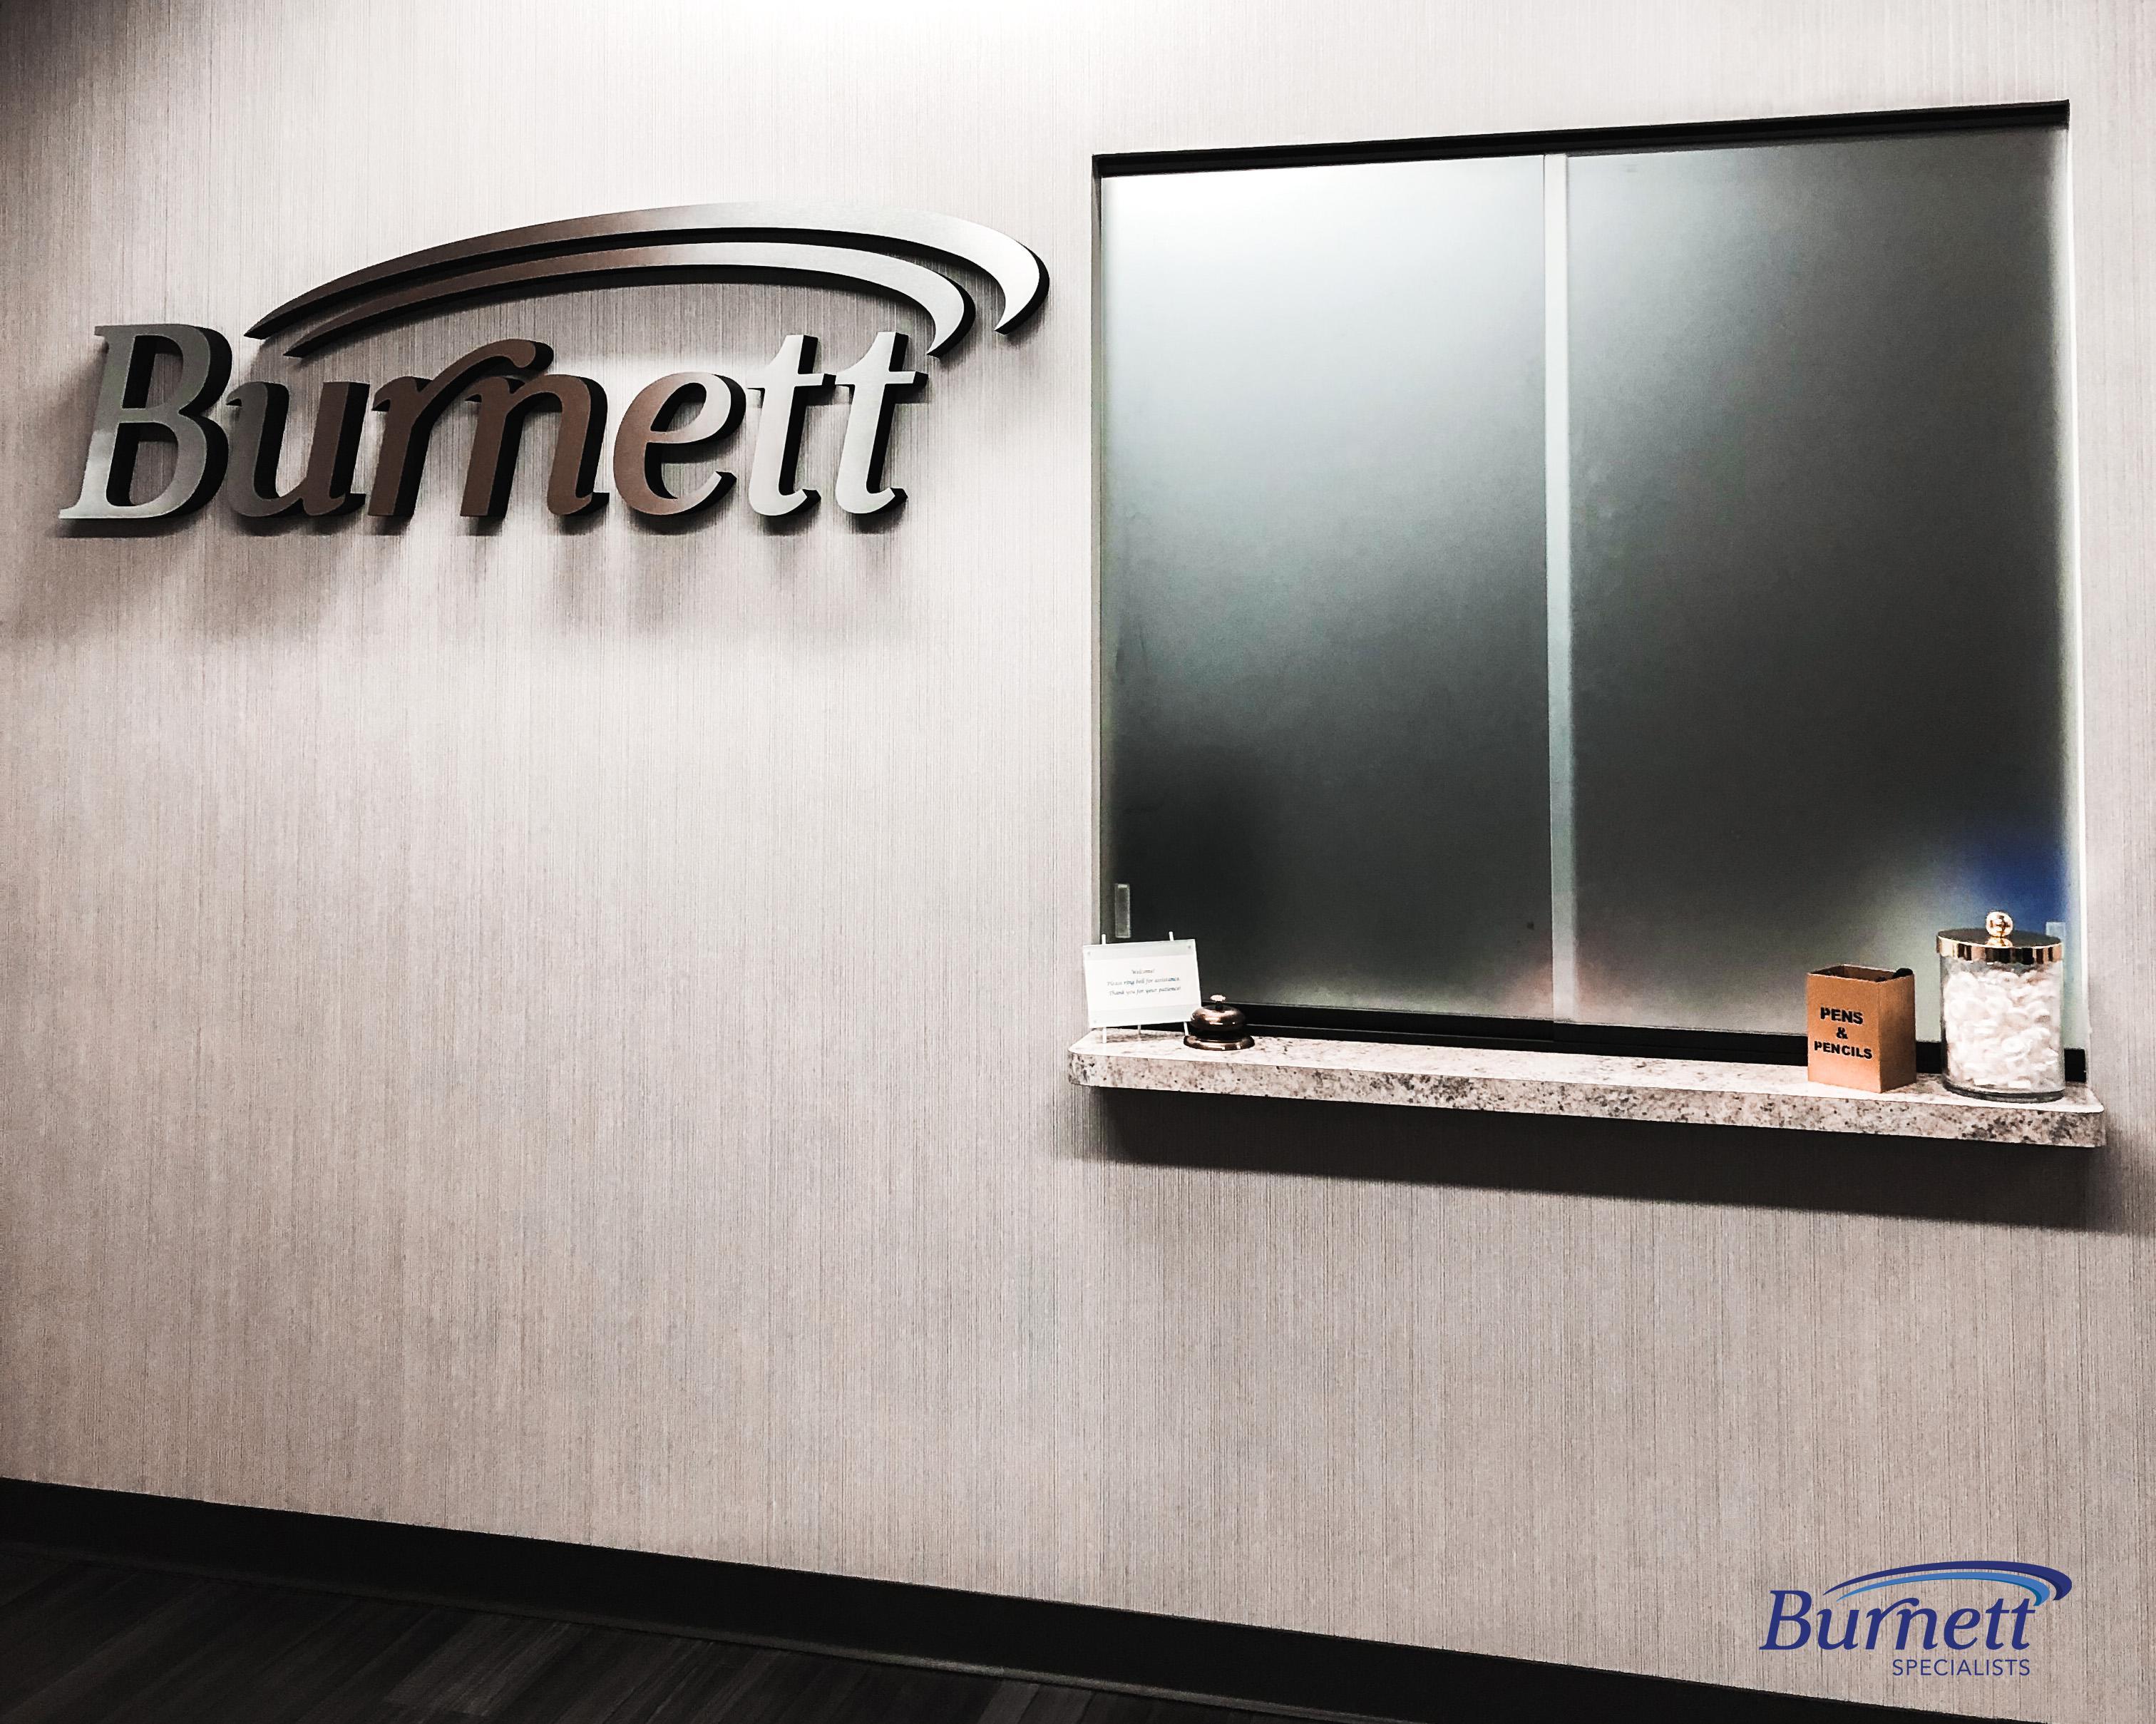 Burnett Specialists Staffing & Recruiting